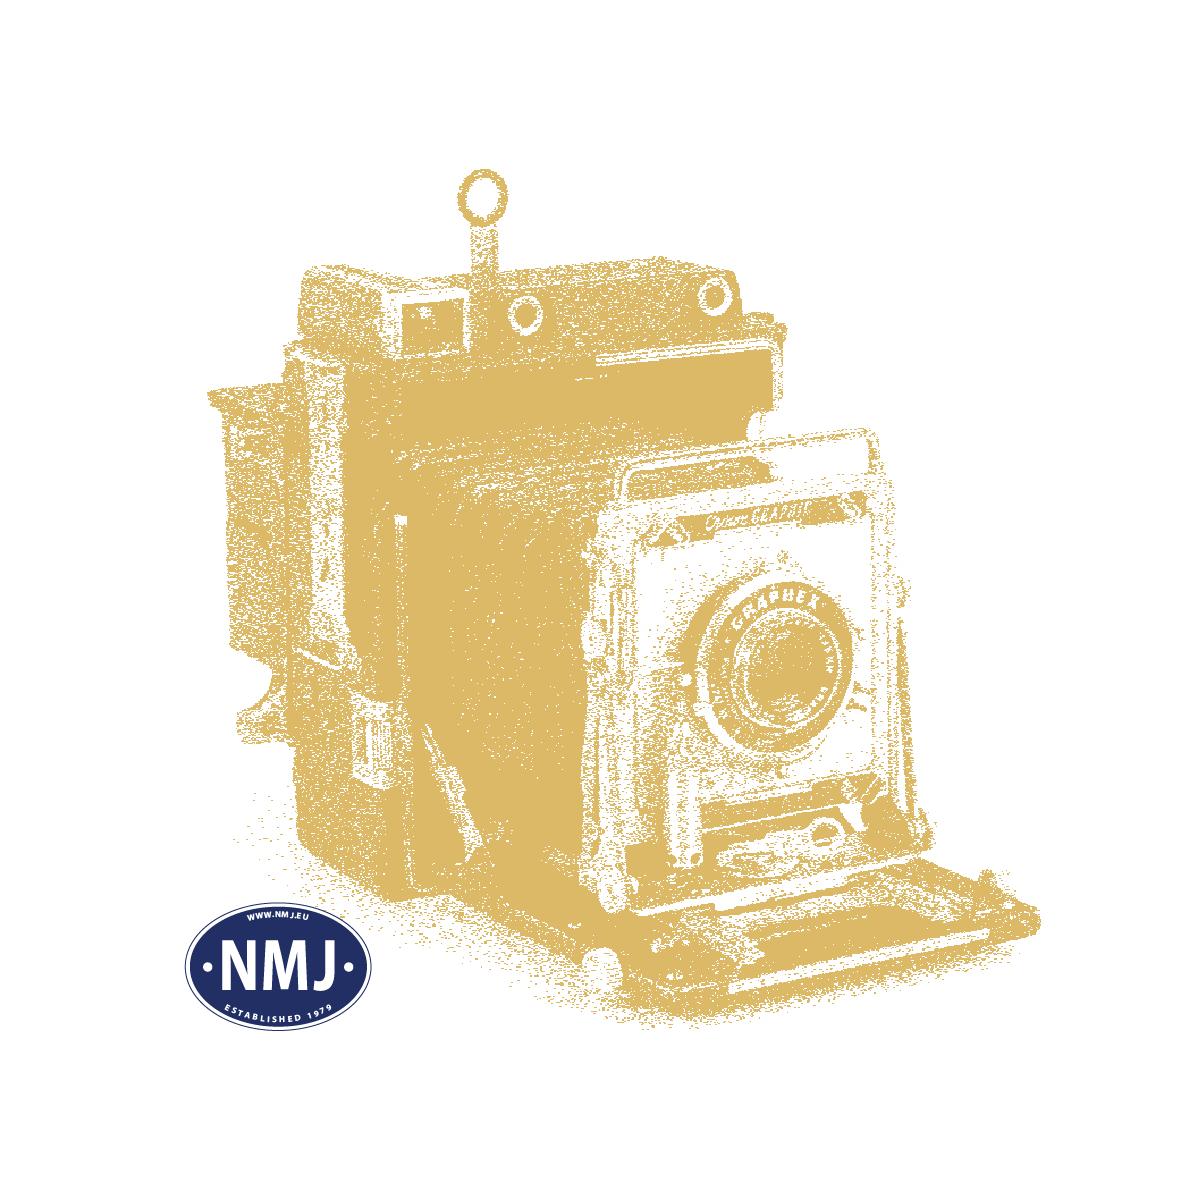 Superline Vogner, NMJSFb0010-NMJ-Superline-NSB Fb-w 603 0010-5-T.2 -wood-chip-waggon-handmade-brassmodel-HO, NMJSFb0010